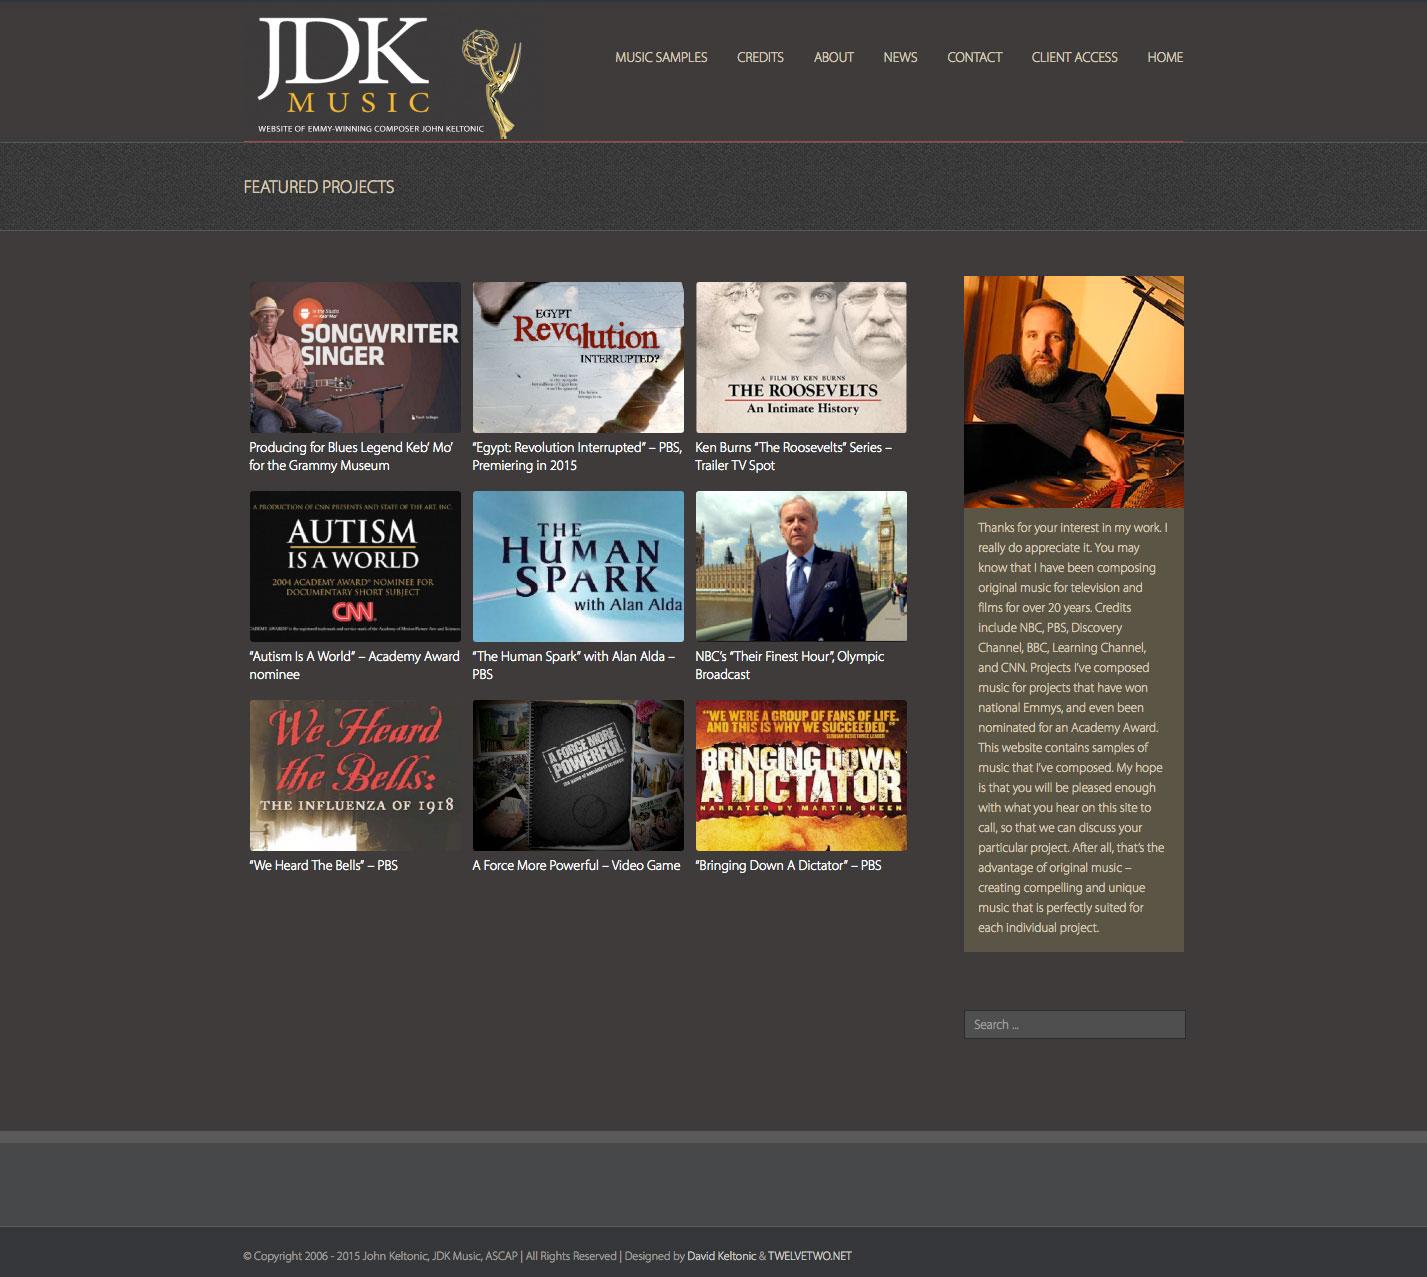 jdk-home-port